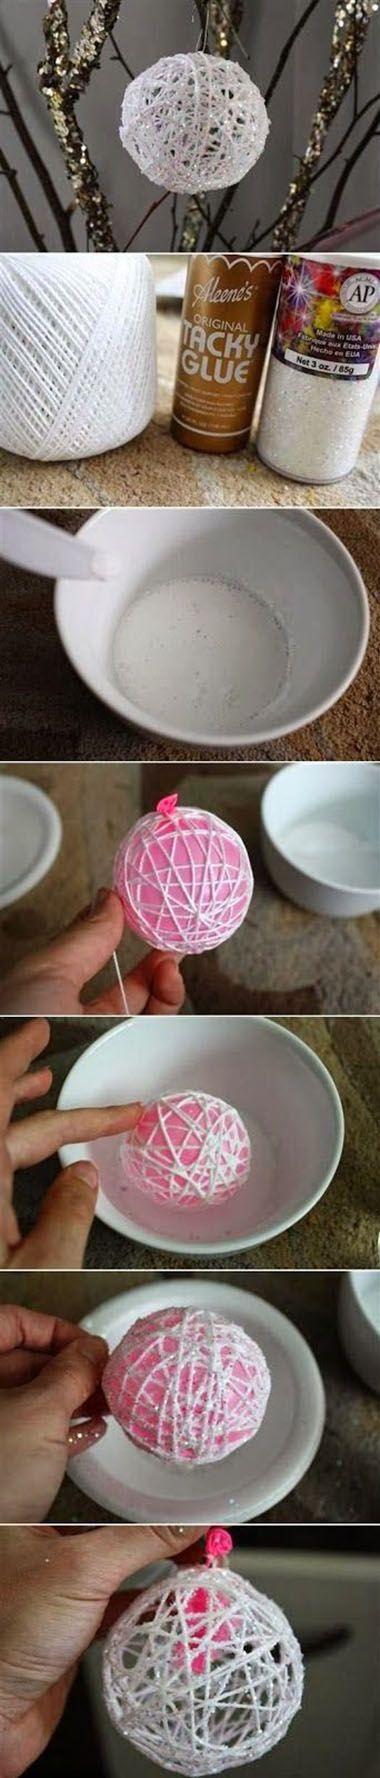 Diy Beautiful Snowball | DIY & Crafts Tutorials